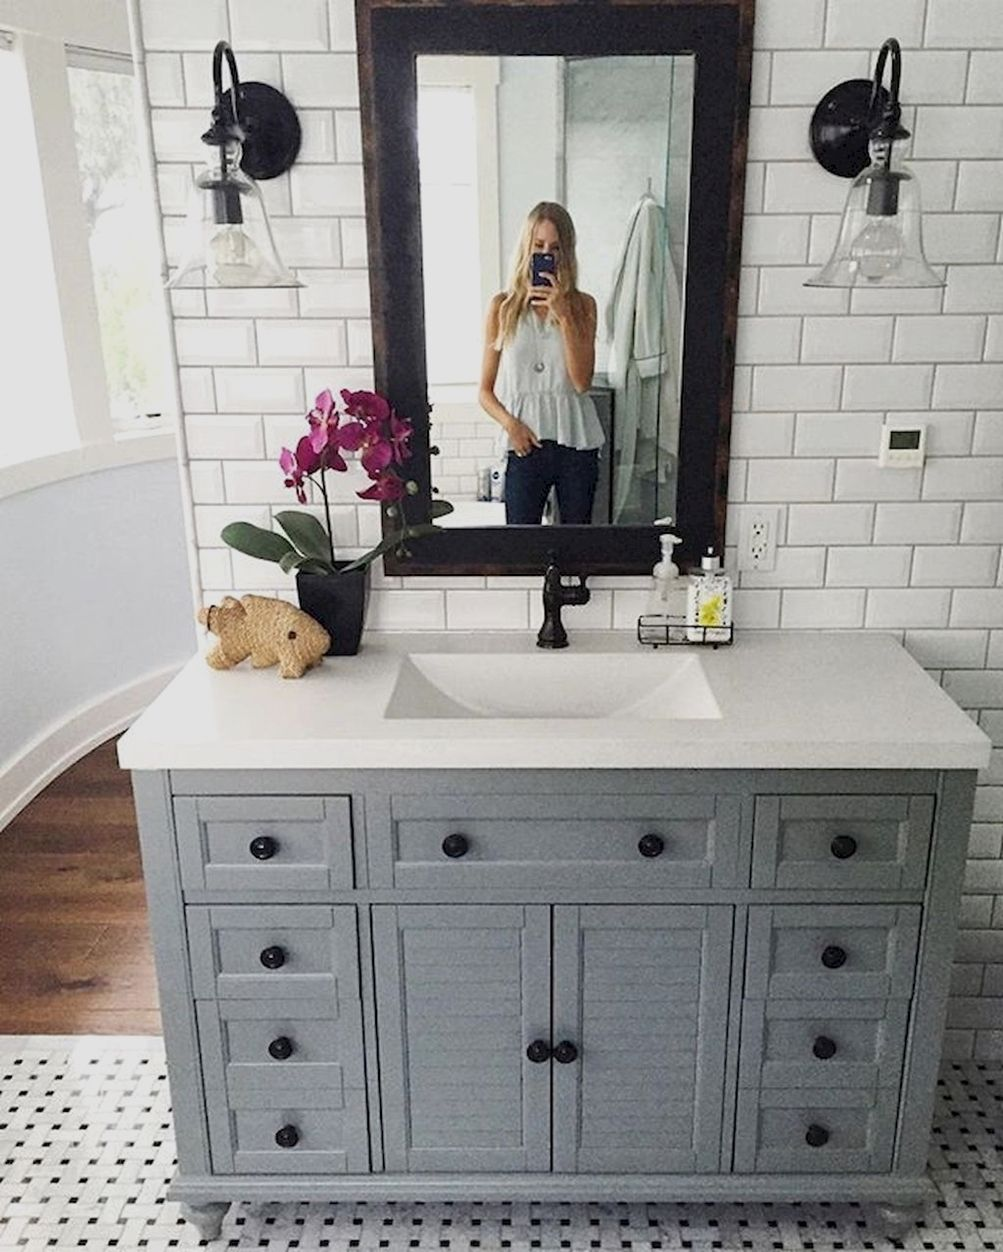 Badezimmer dekor strand thema basement heater  remodeling ideas in   pinterest  bathroom